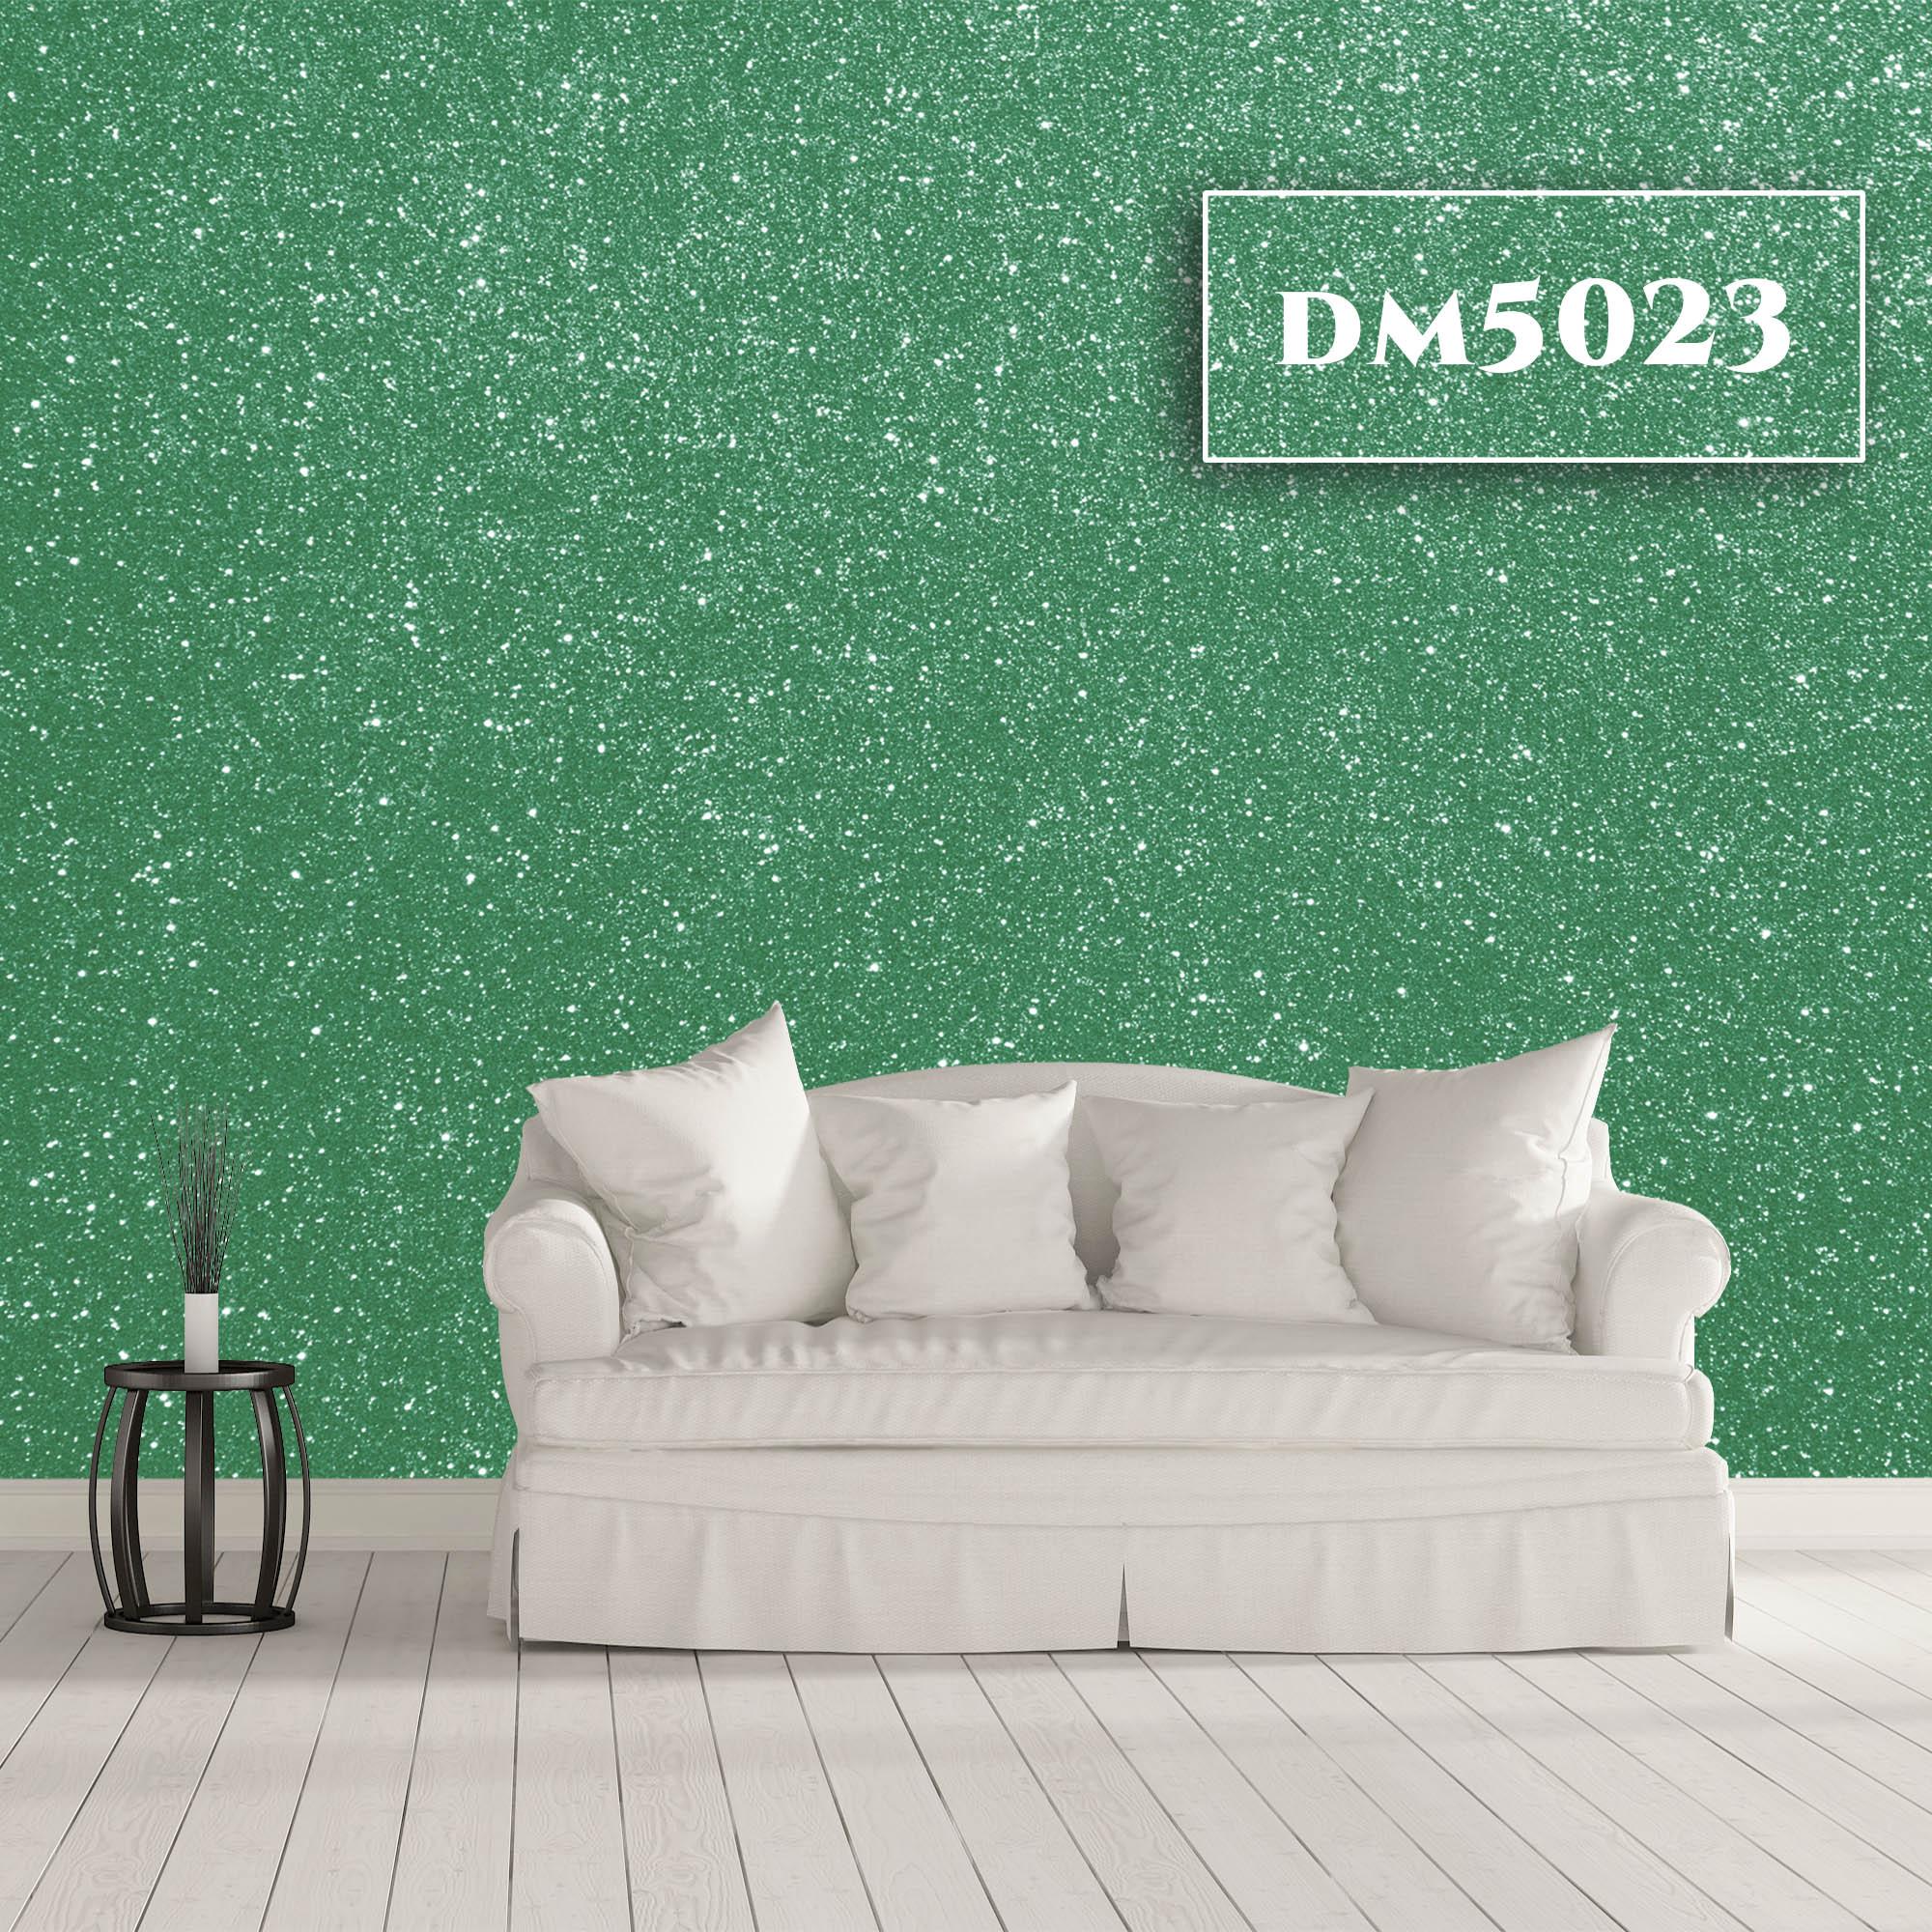 DM5023